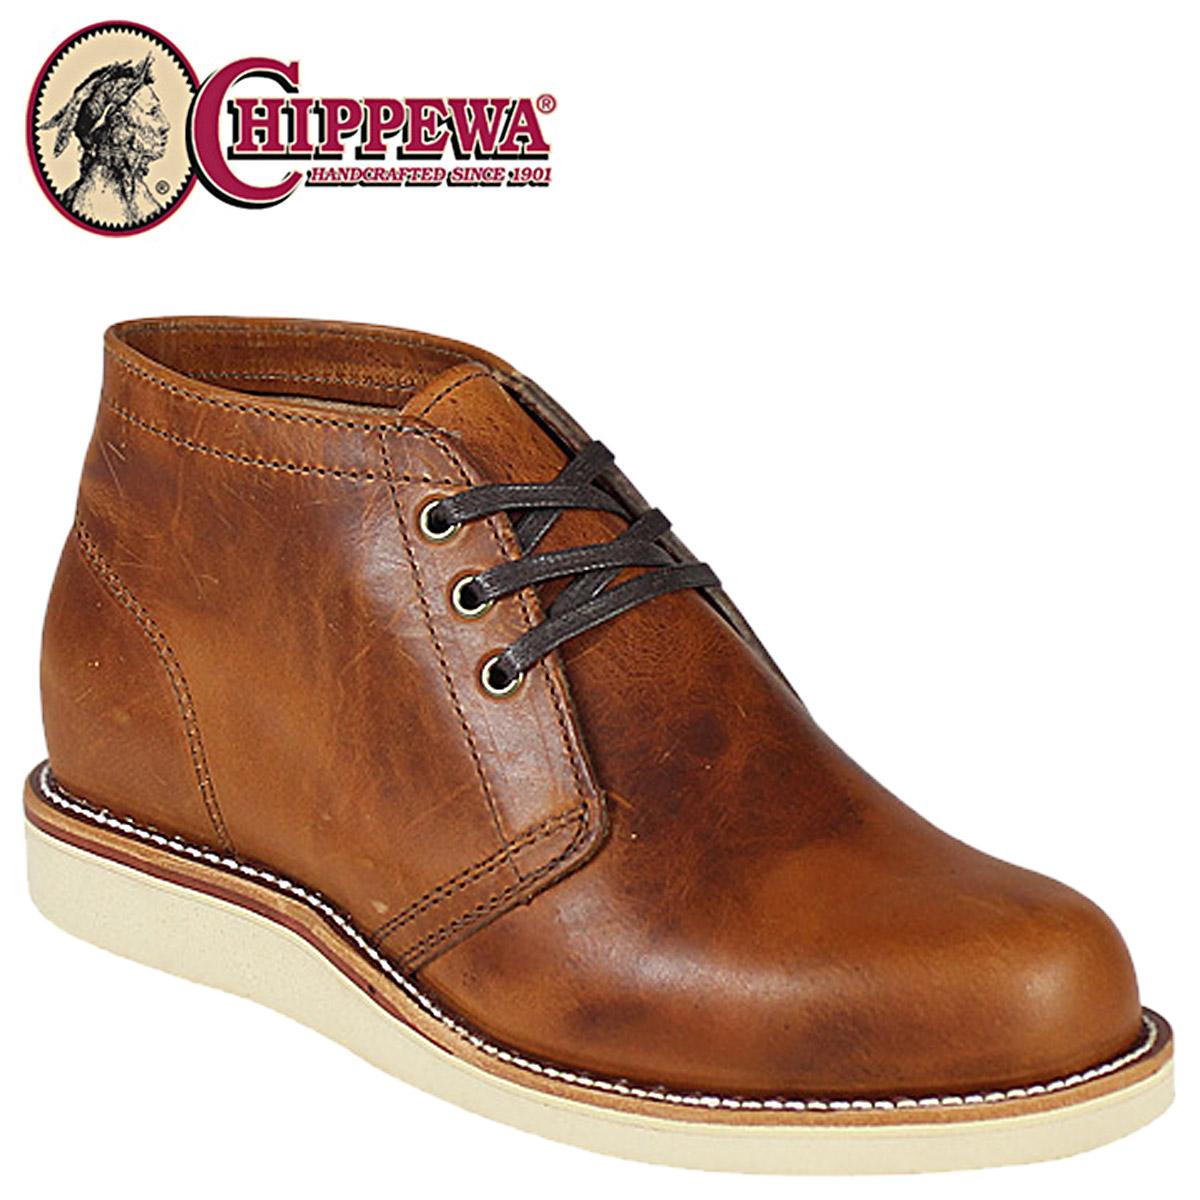 SneaK Online Shop  Chippewa CHIPPEWA 5 inch plain to chukka boots 5 ... fe262e25e580